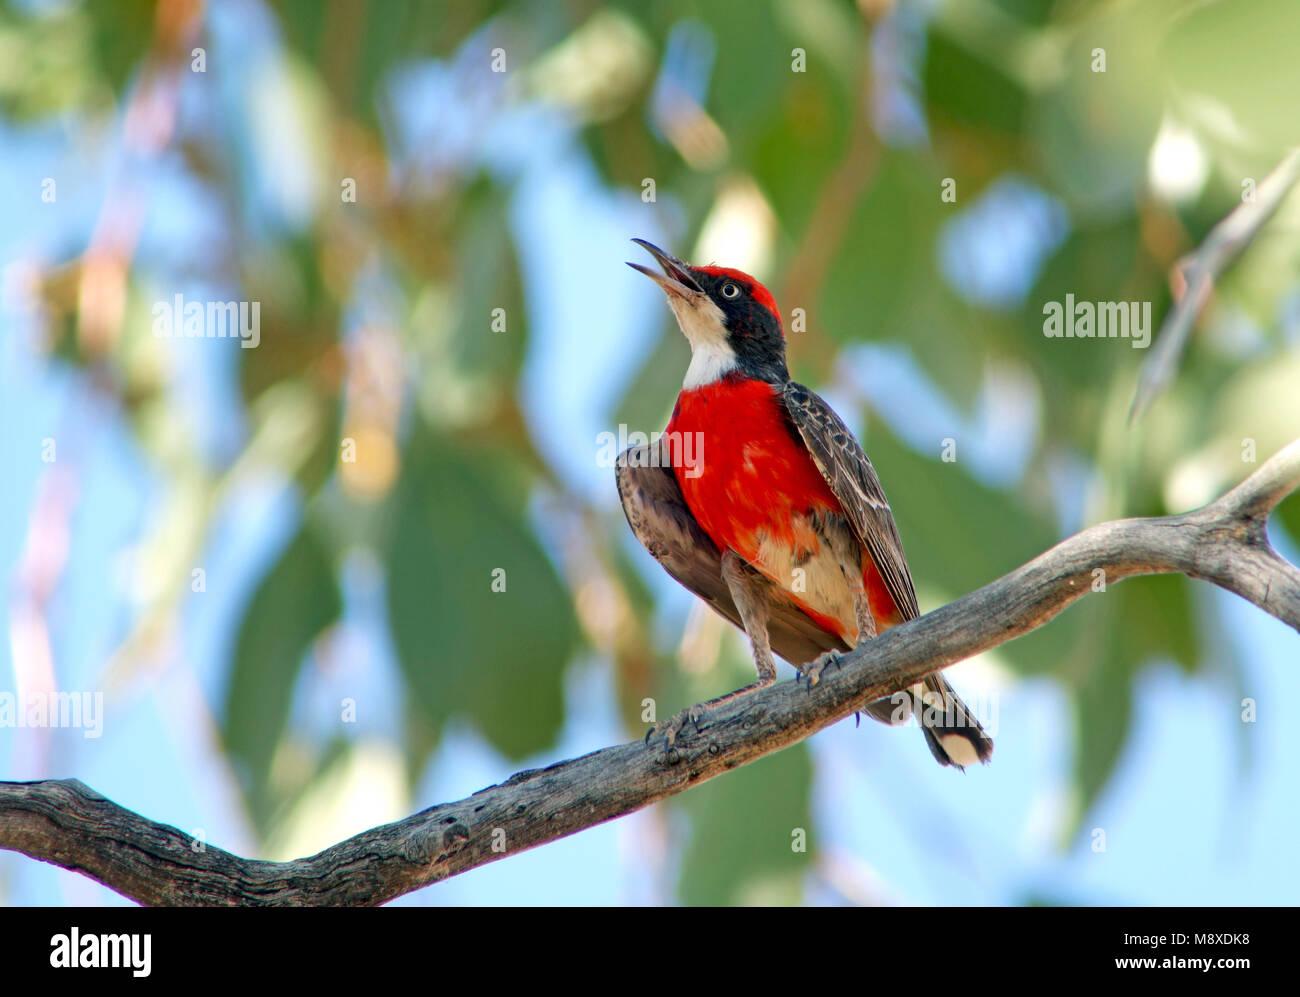 Bird image made by Pete Morris - Stock Image